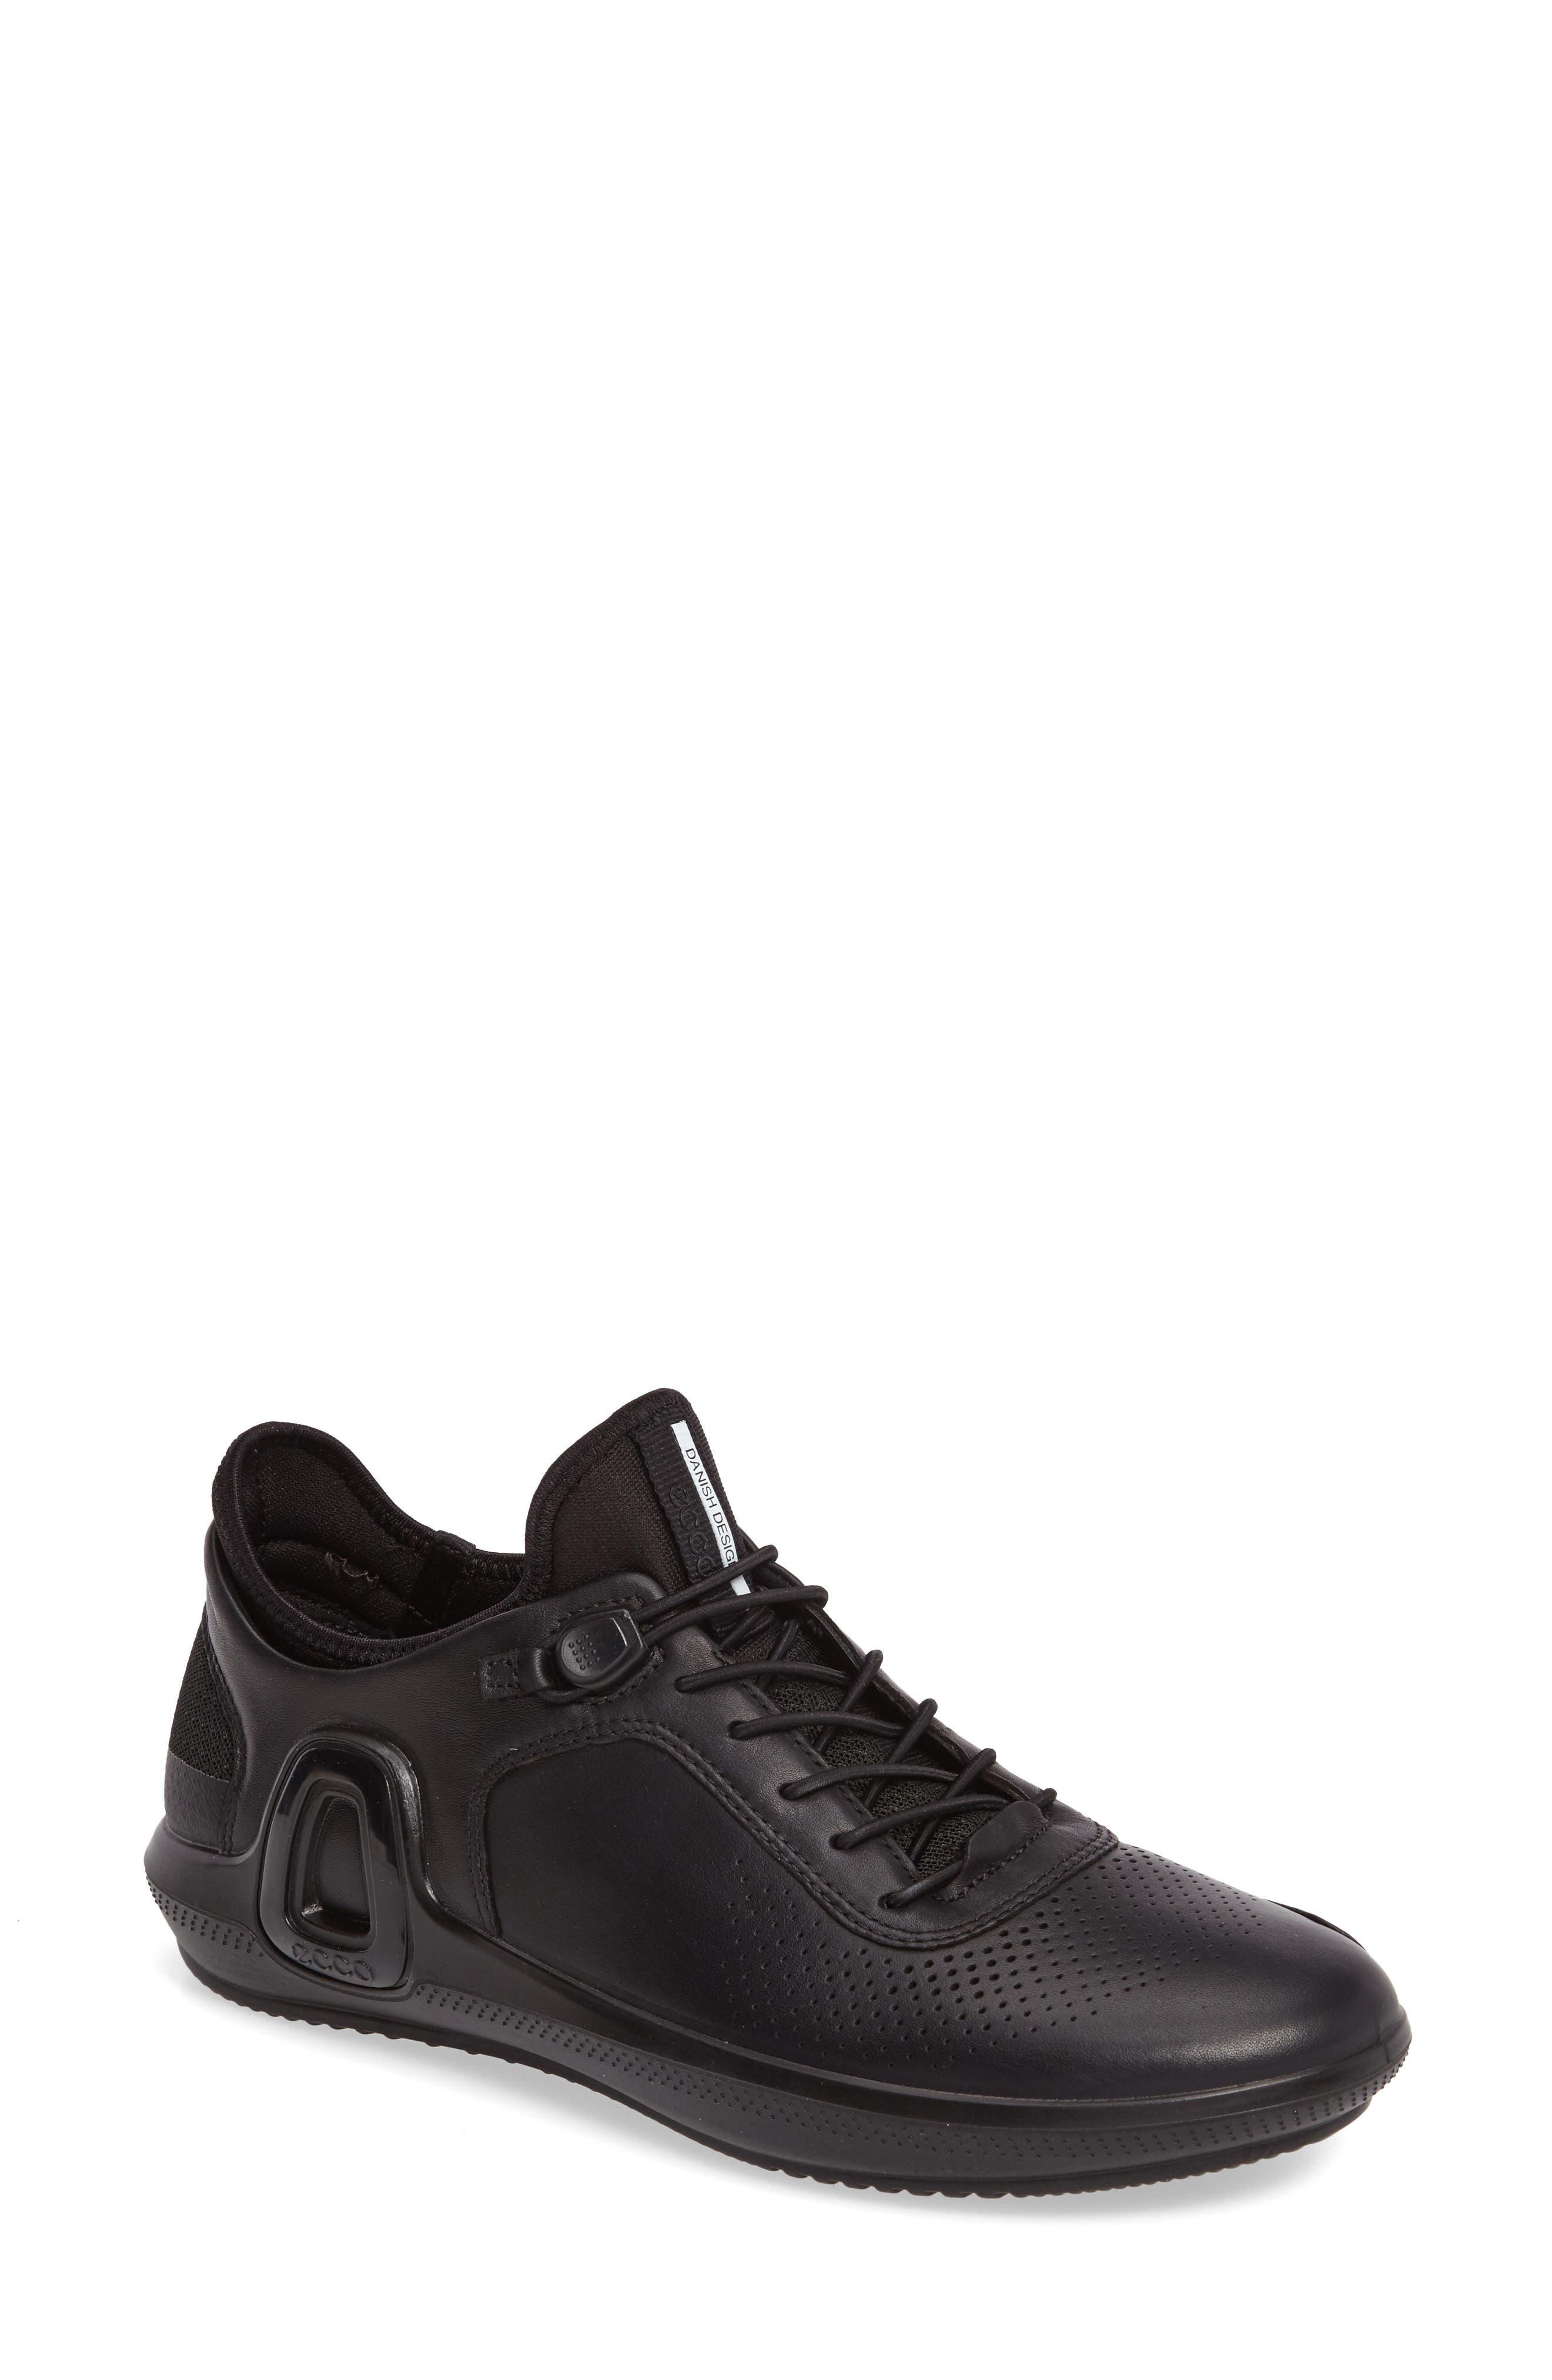 ECCO Intrinsic 3 Sneaker